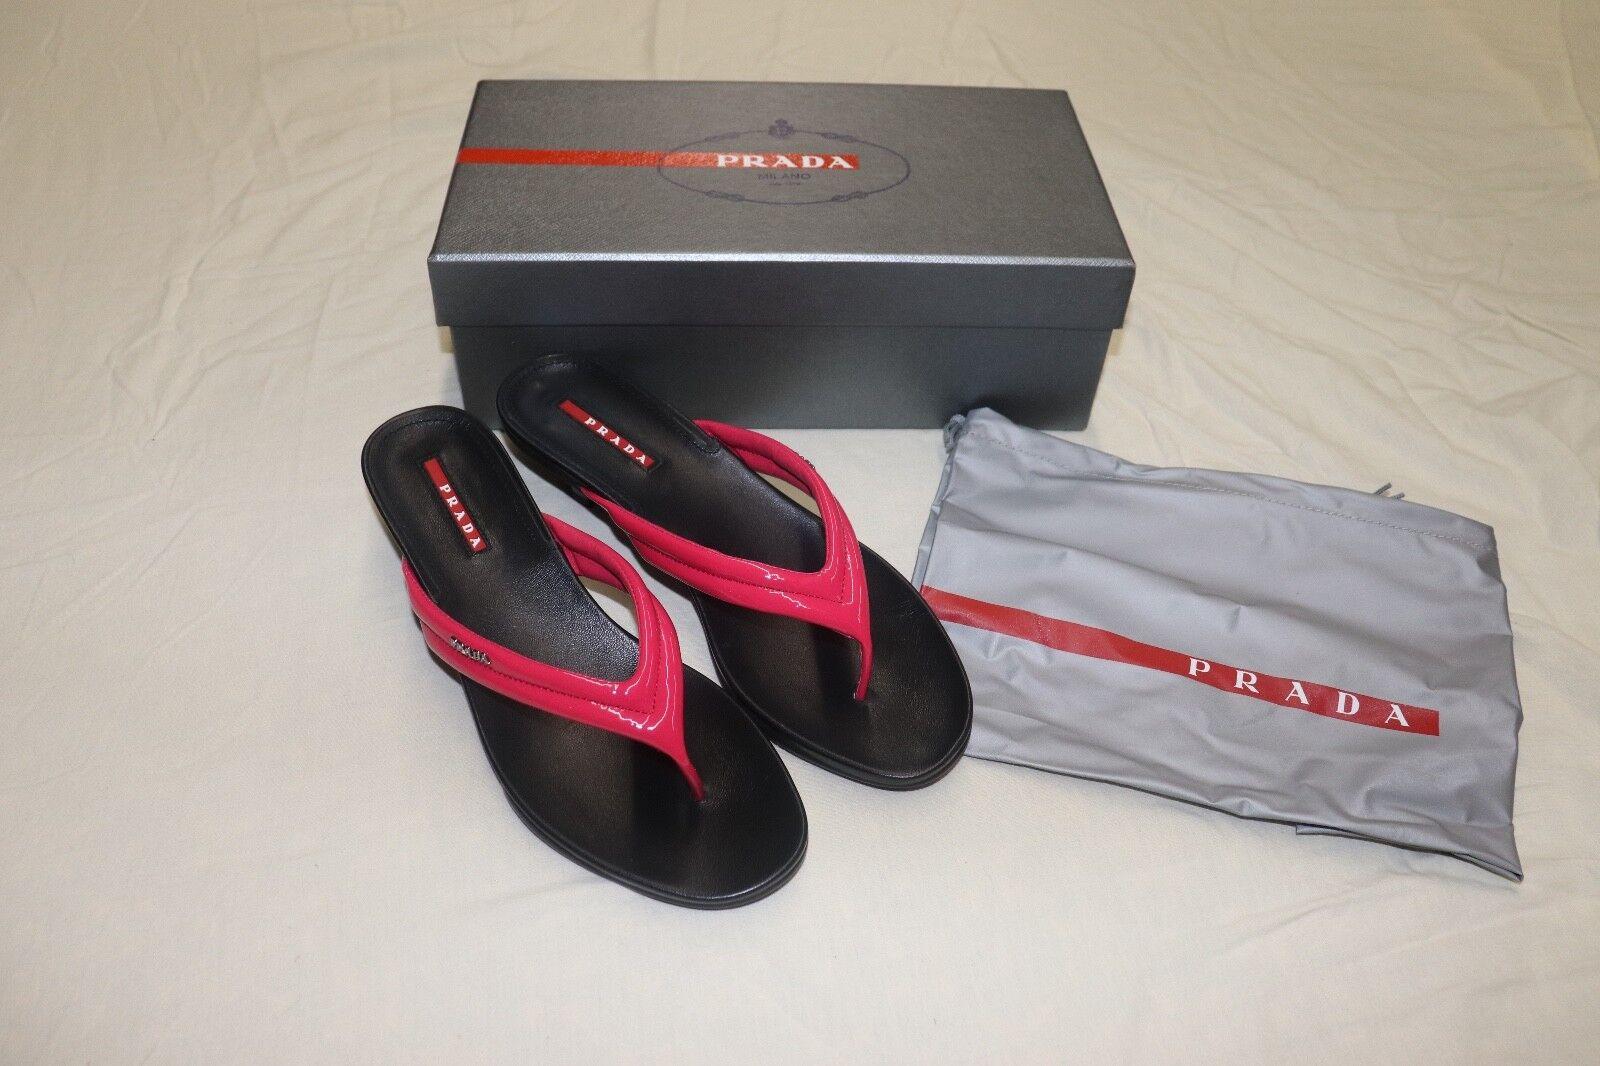 Prada Calzature women Fuxia sandals with a heel, Pink size 8.5